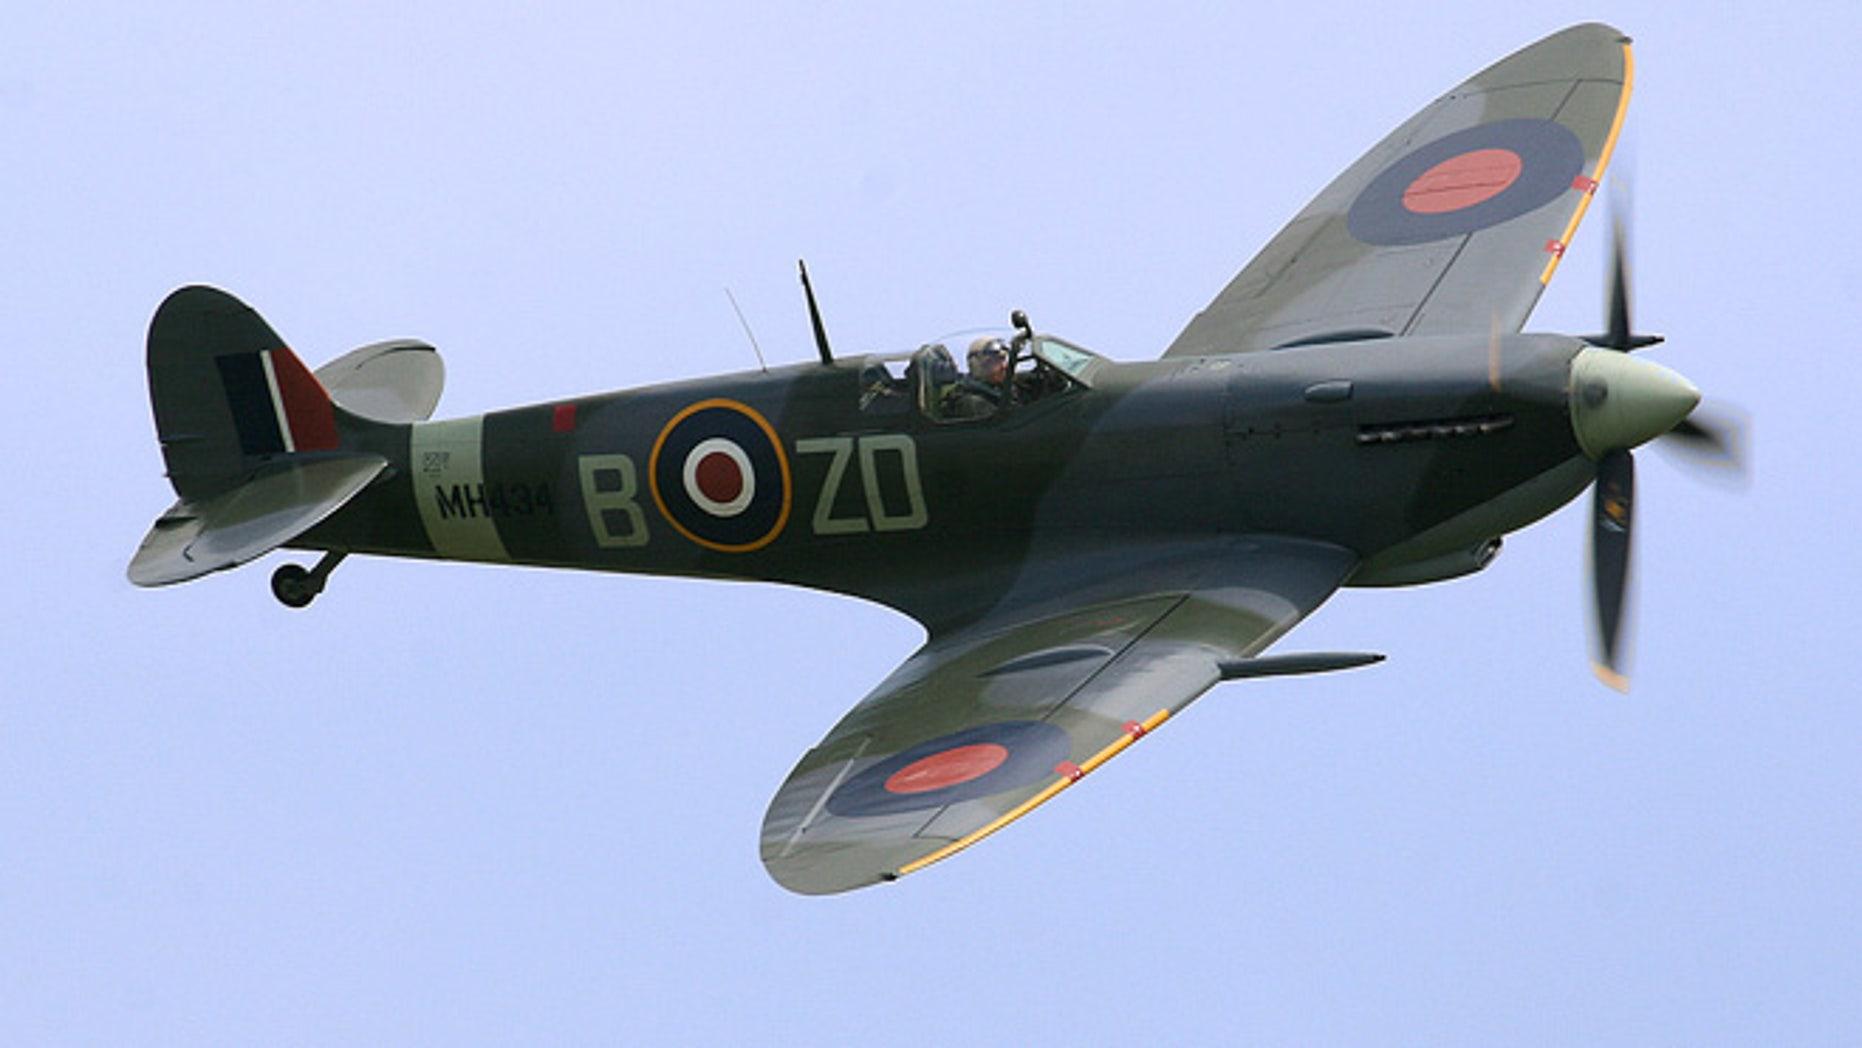 A Spitfire LF Mk IX, flown by Ray Hanna in 2005.